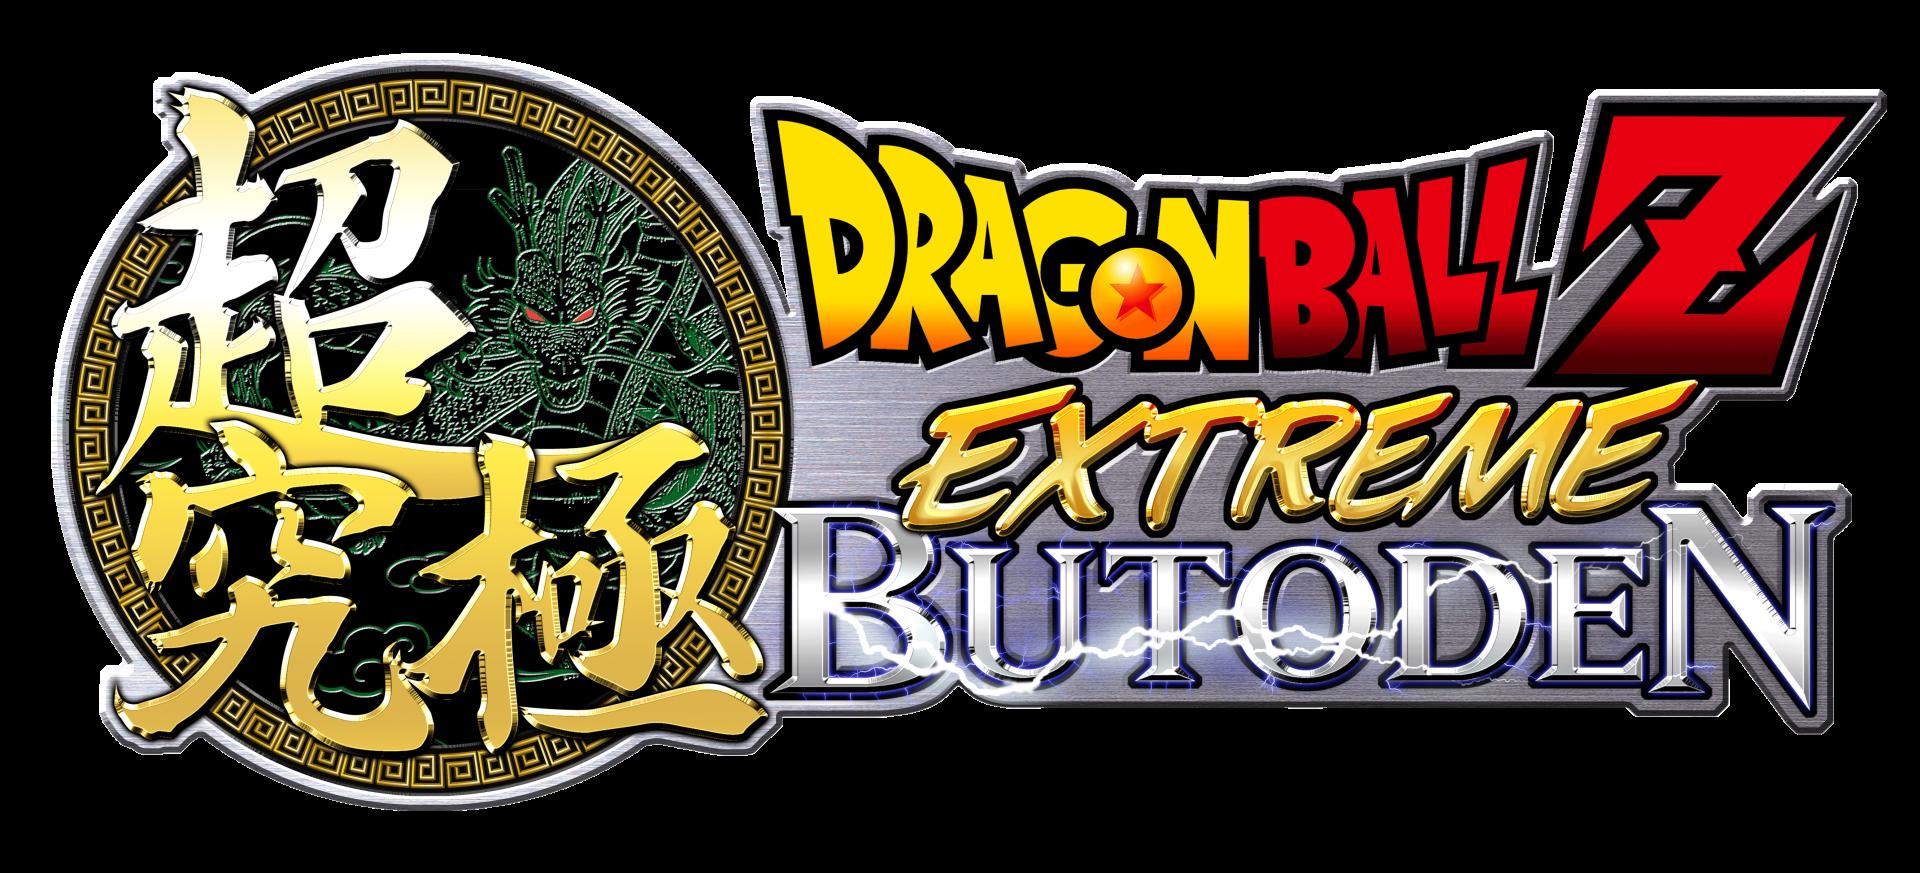 Bandai Namco Reveals Dragon Ball Z Extreme Butoden